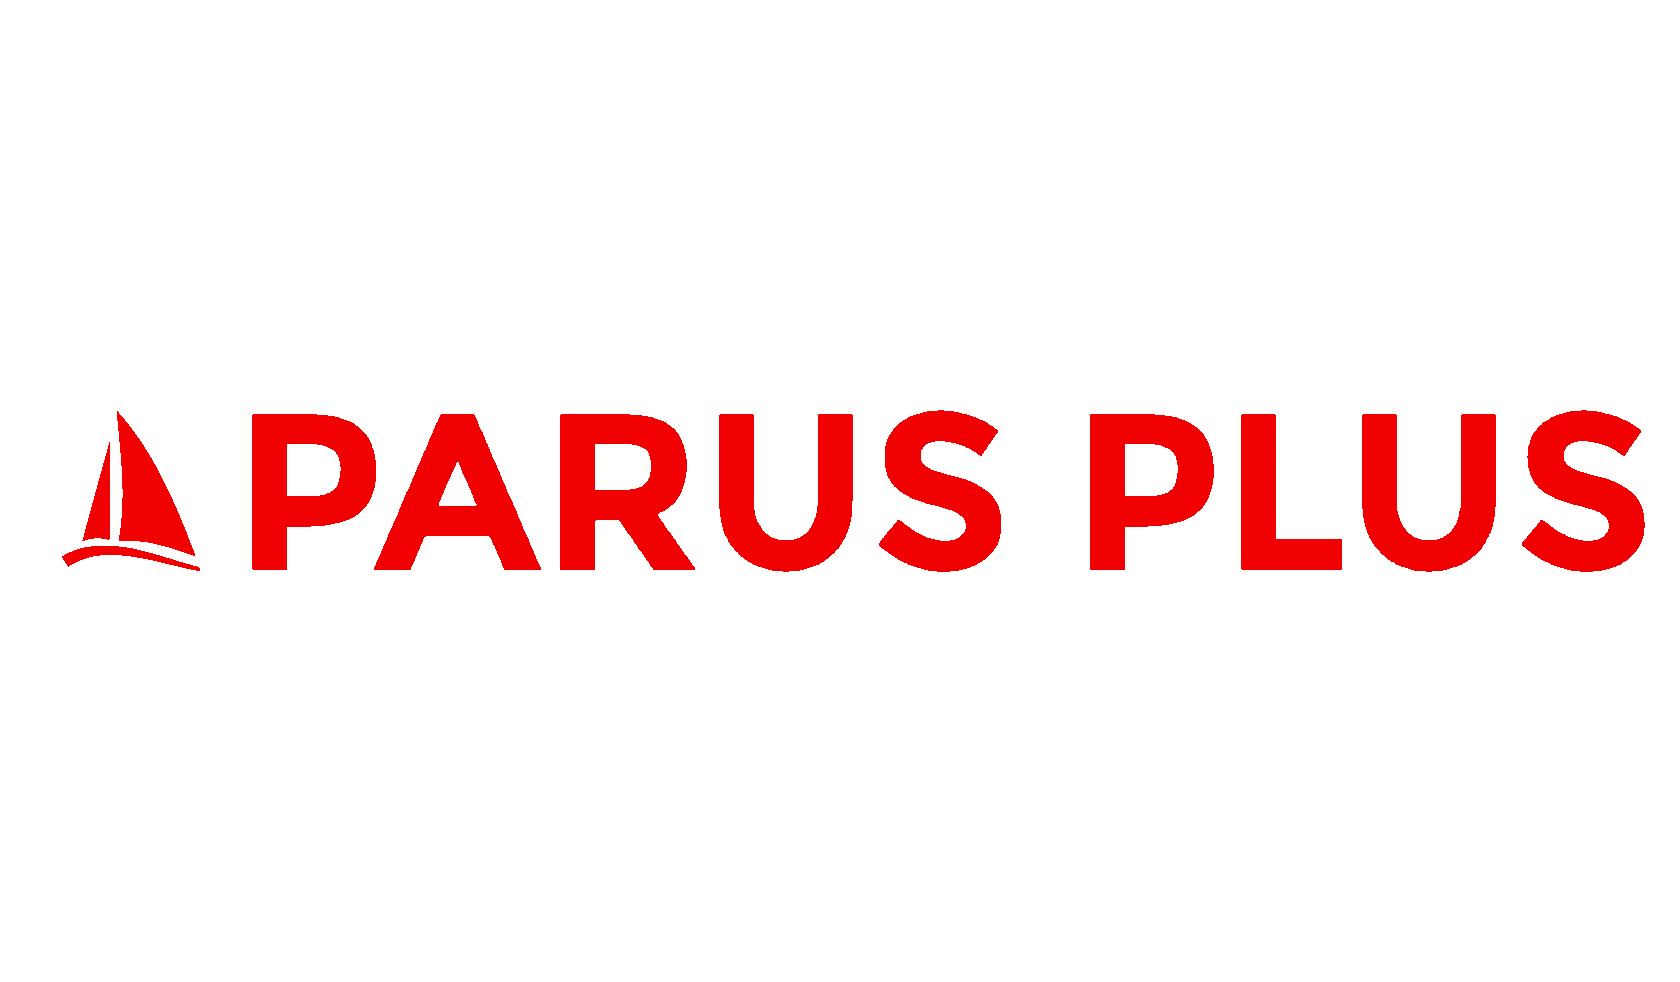 PARUS PLUS